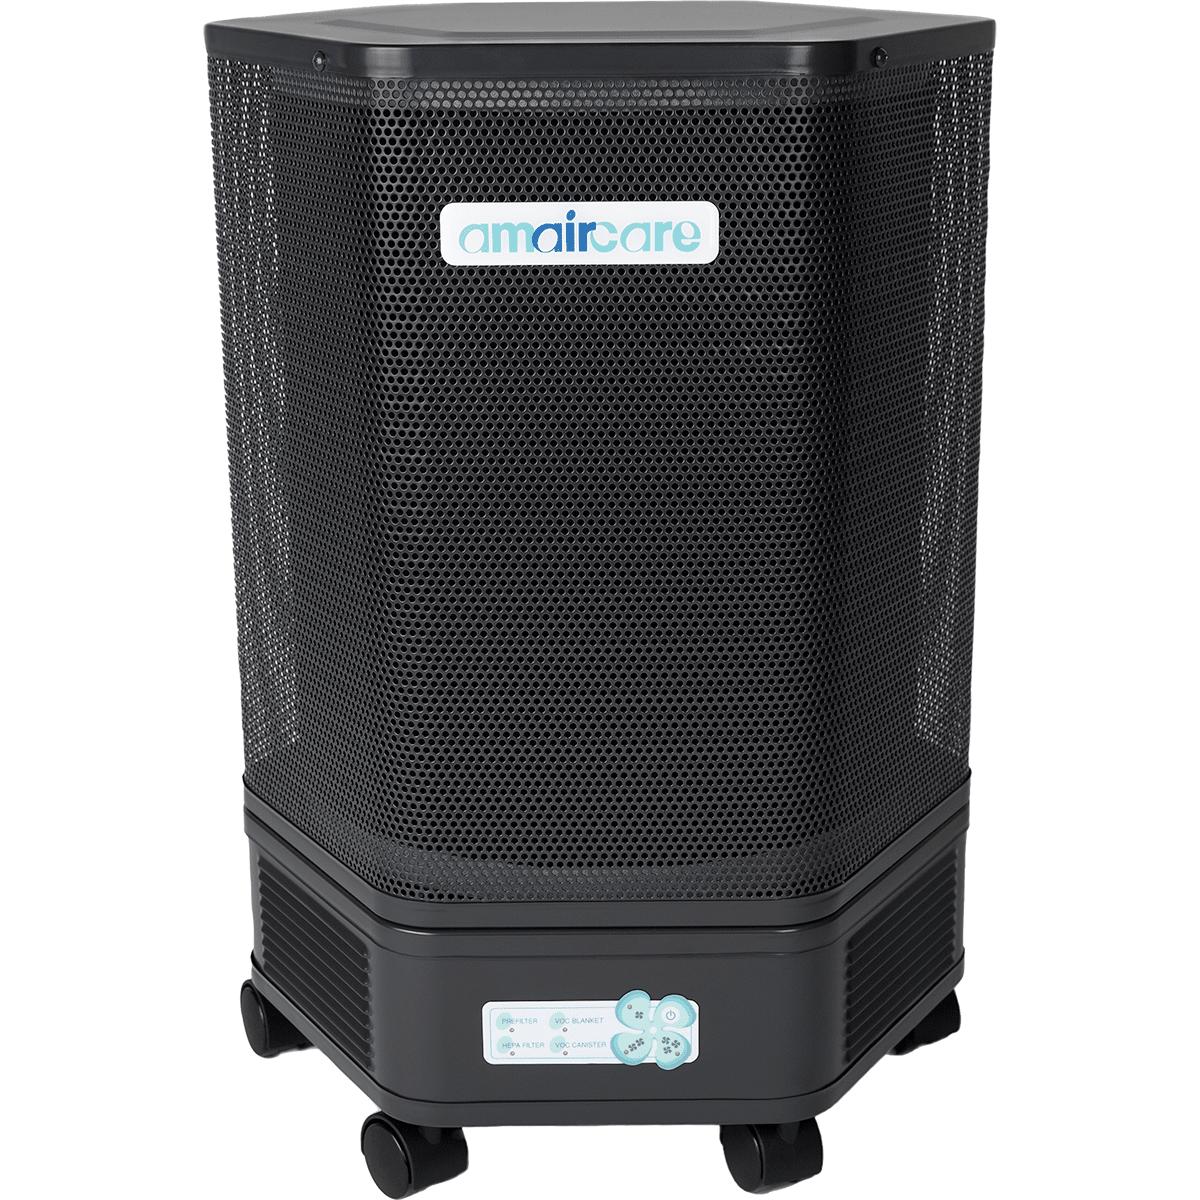 Image of Amaircare 3000 Hepa Air Purifier - Slate